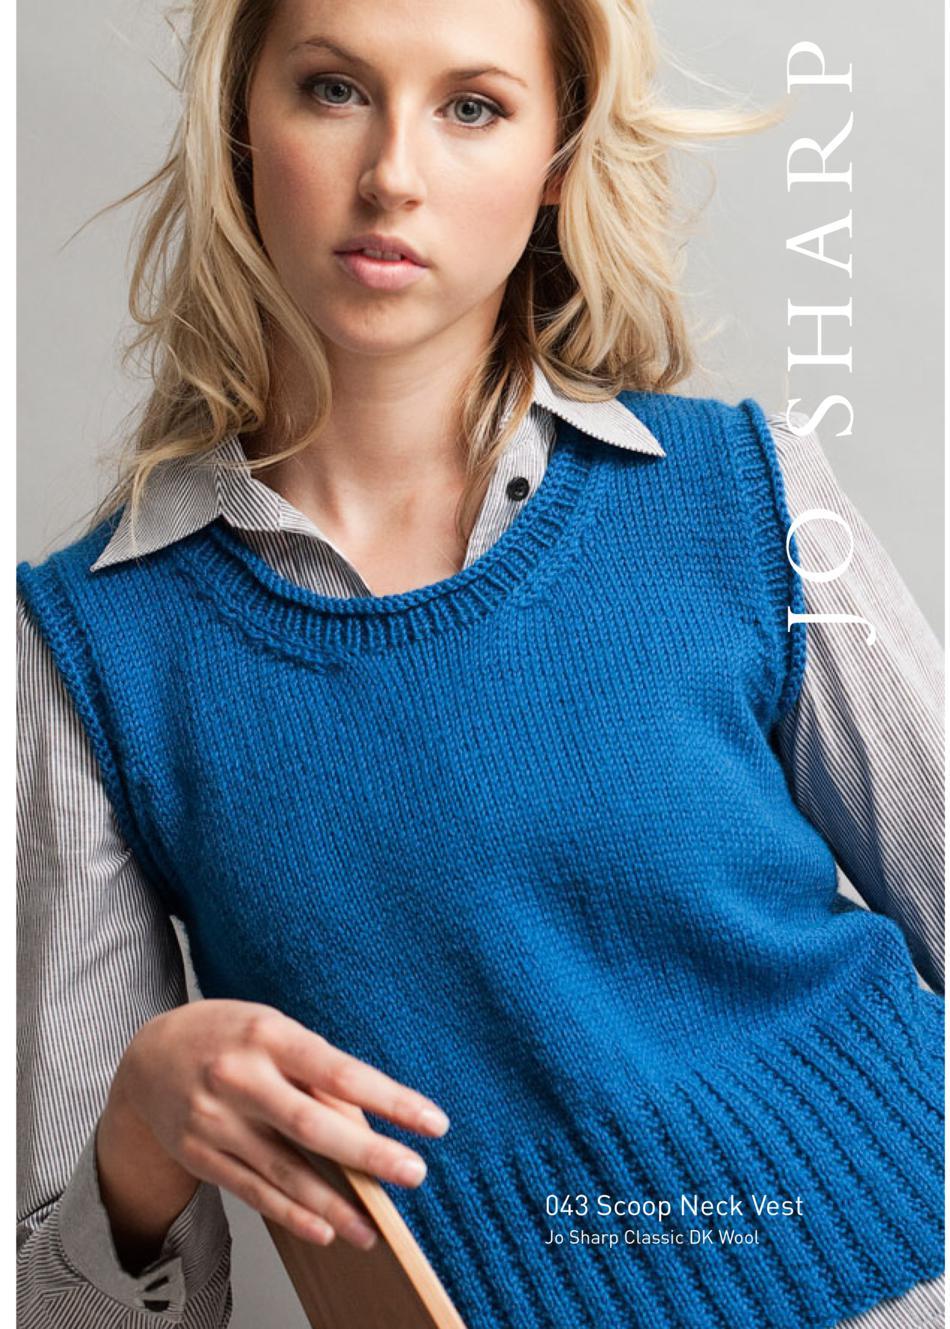 Jo Sharp Scoop Neck Vest Pattern, Knitting Pattern - Halcyon Yarn